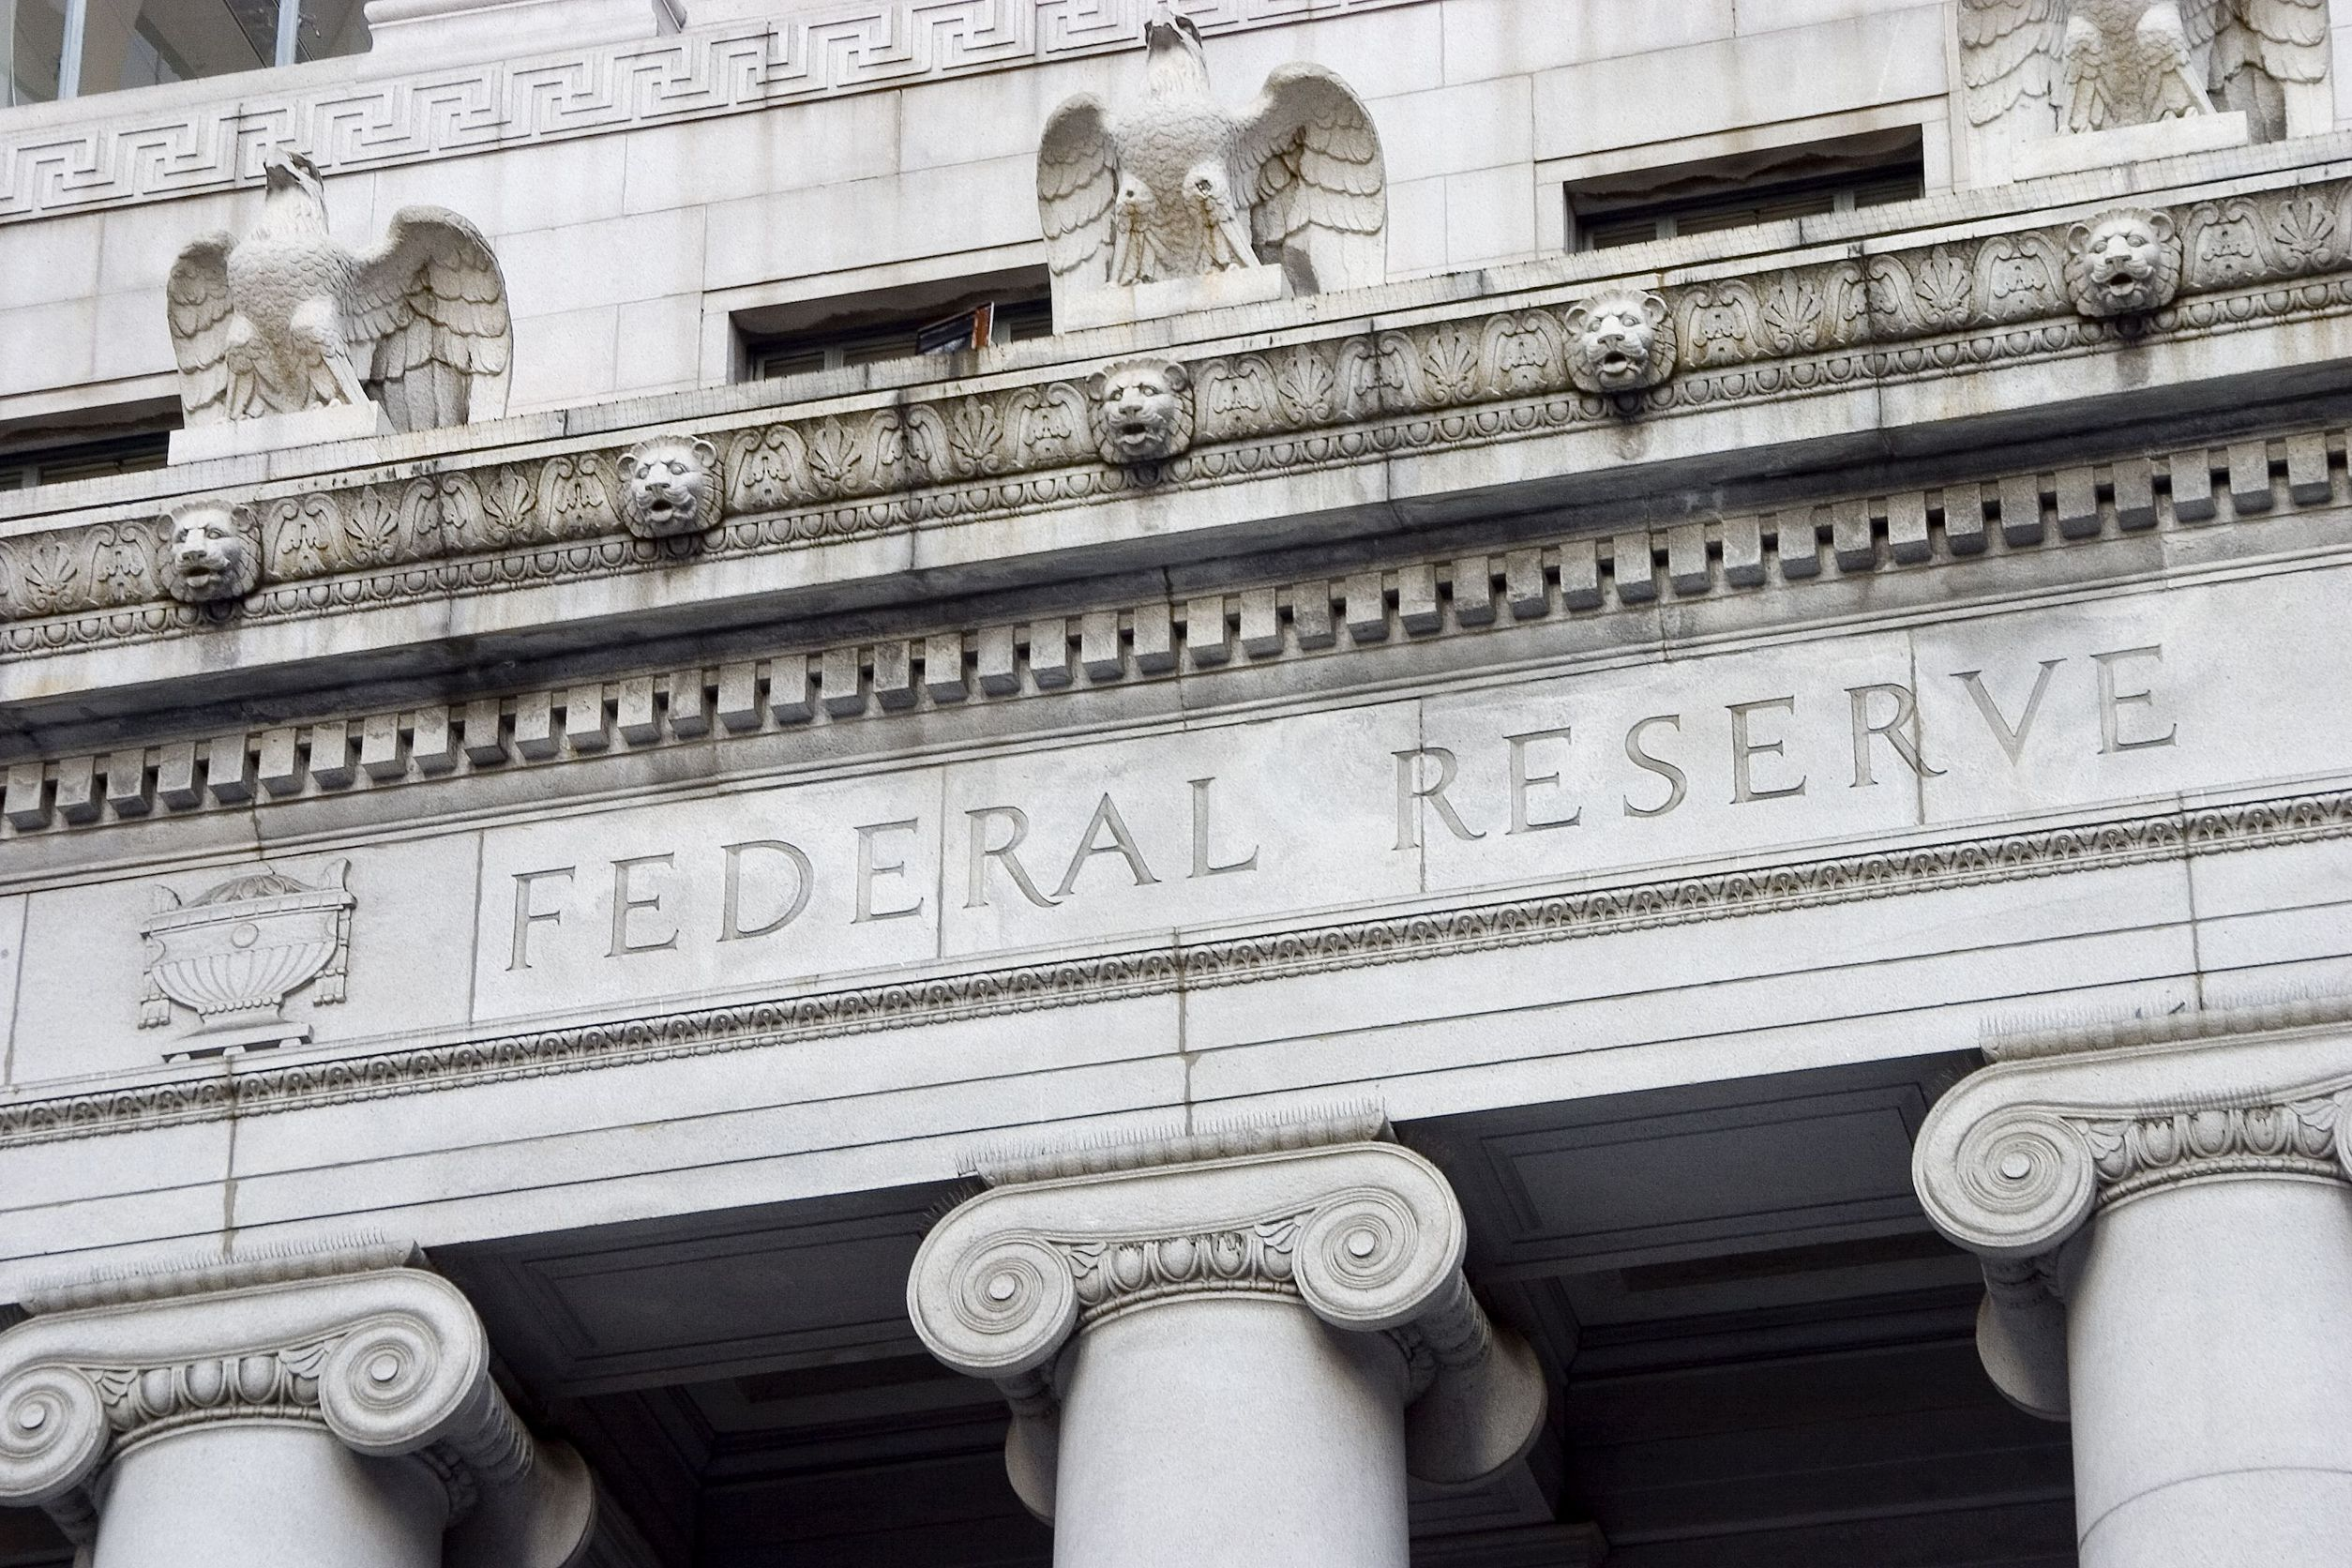 http://icebergfinanza.finanza.com/files/2015/01/meeting-fed-federal-reserve.jpg